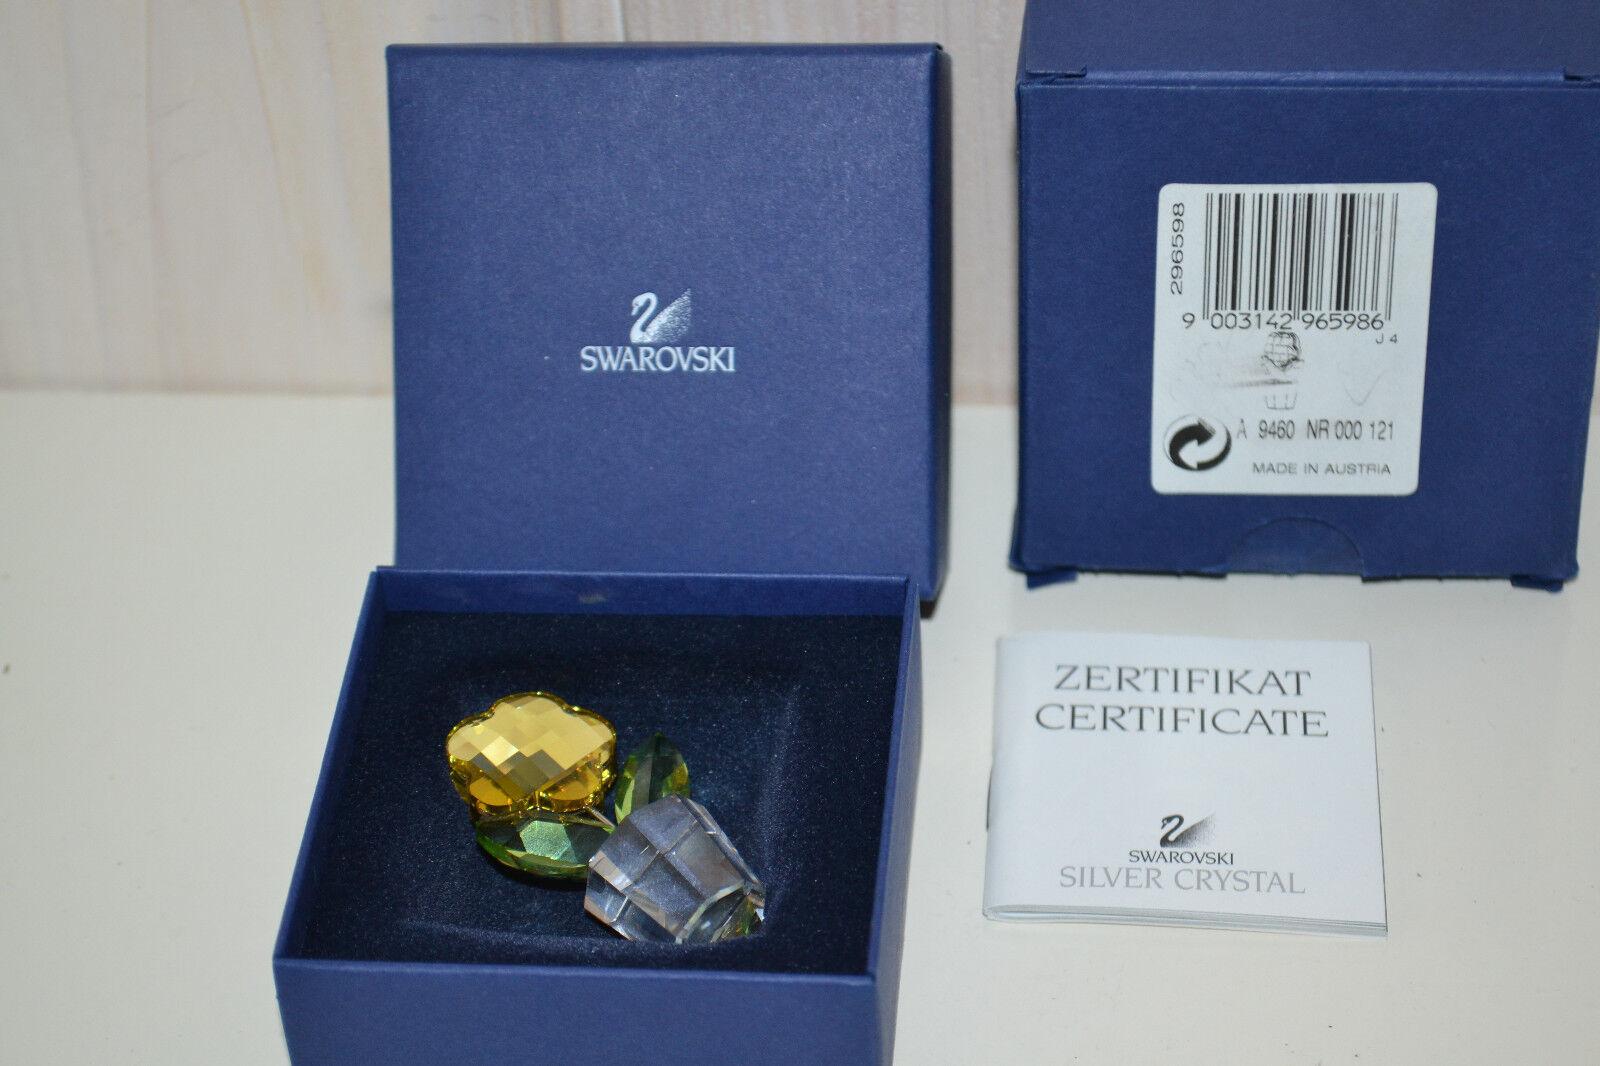 Original-Swarovski-cristal verre crystal-personnage-Pot de fleurs Blümen-Pittoresque-OV. & excludecaname.